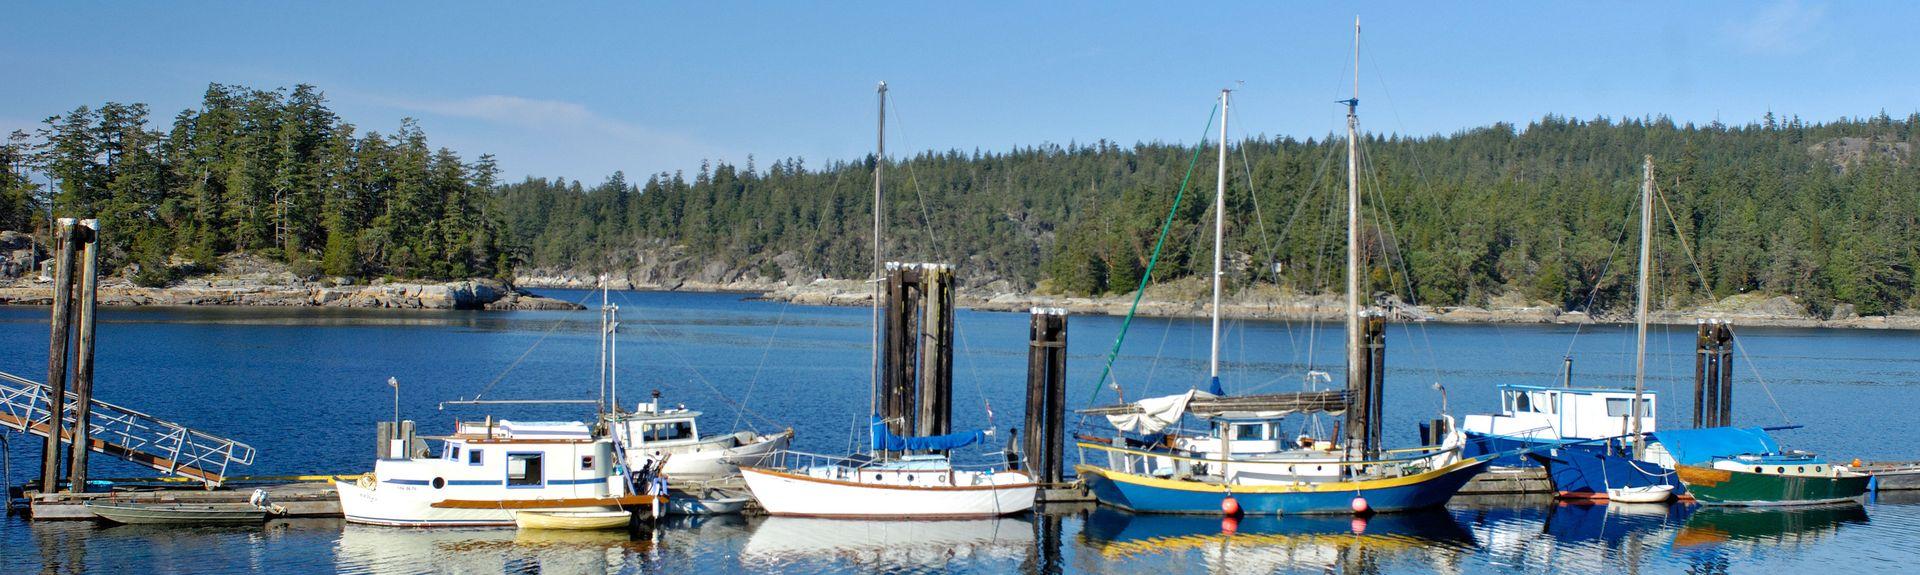 Cortes Island, British Columbia, Canada